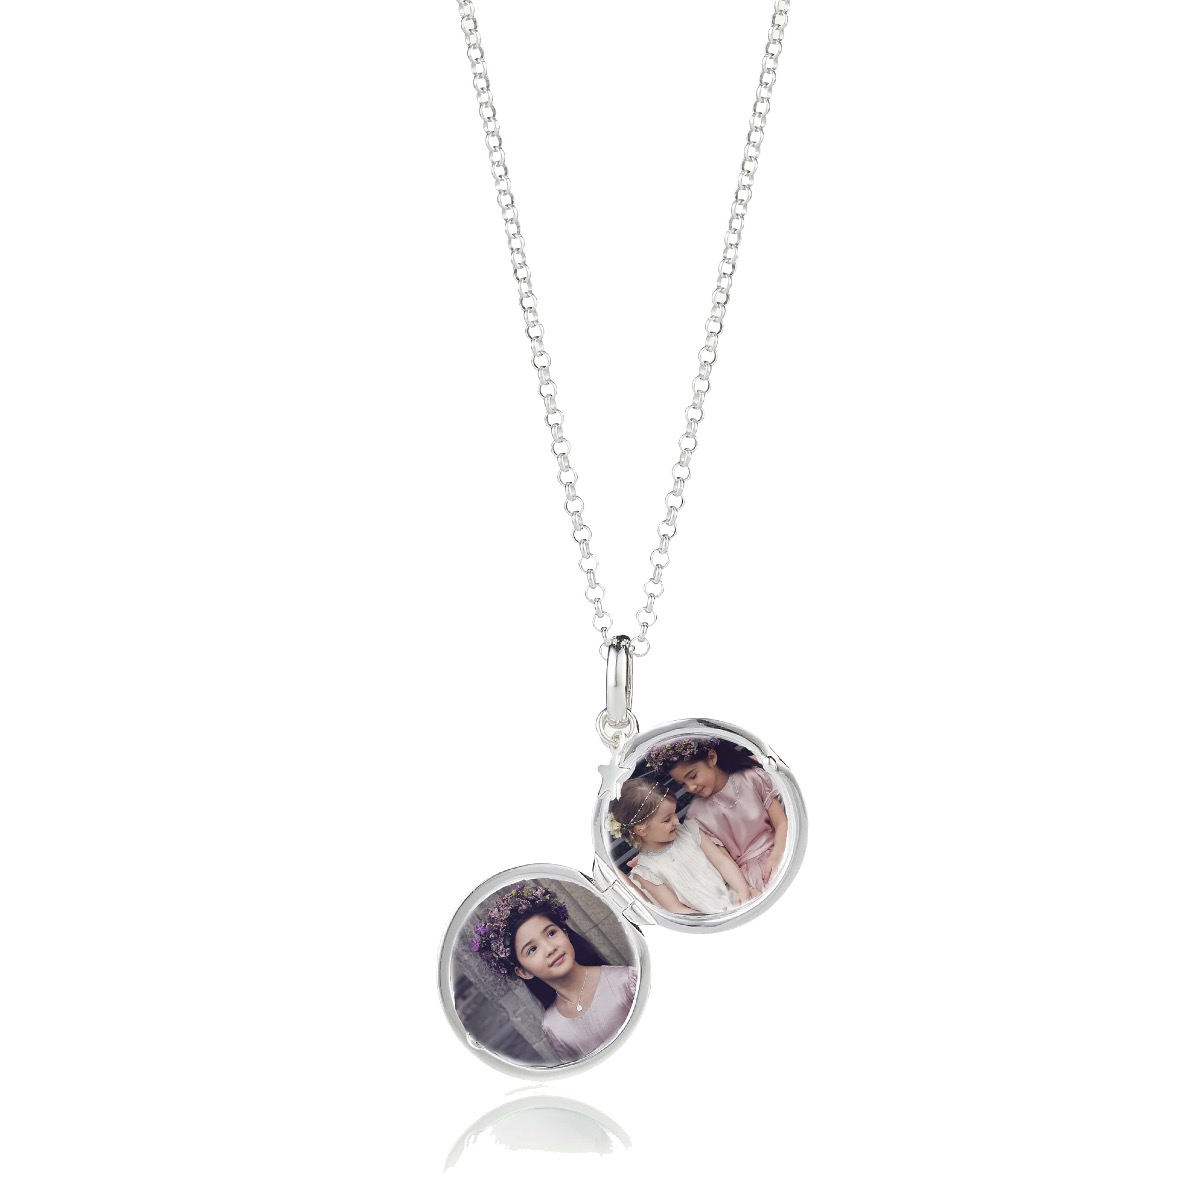 Personalised Forever Diamond Gift Set